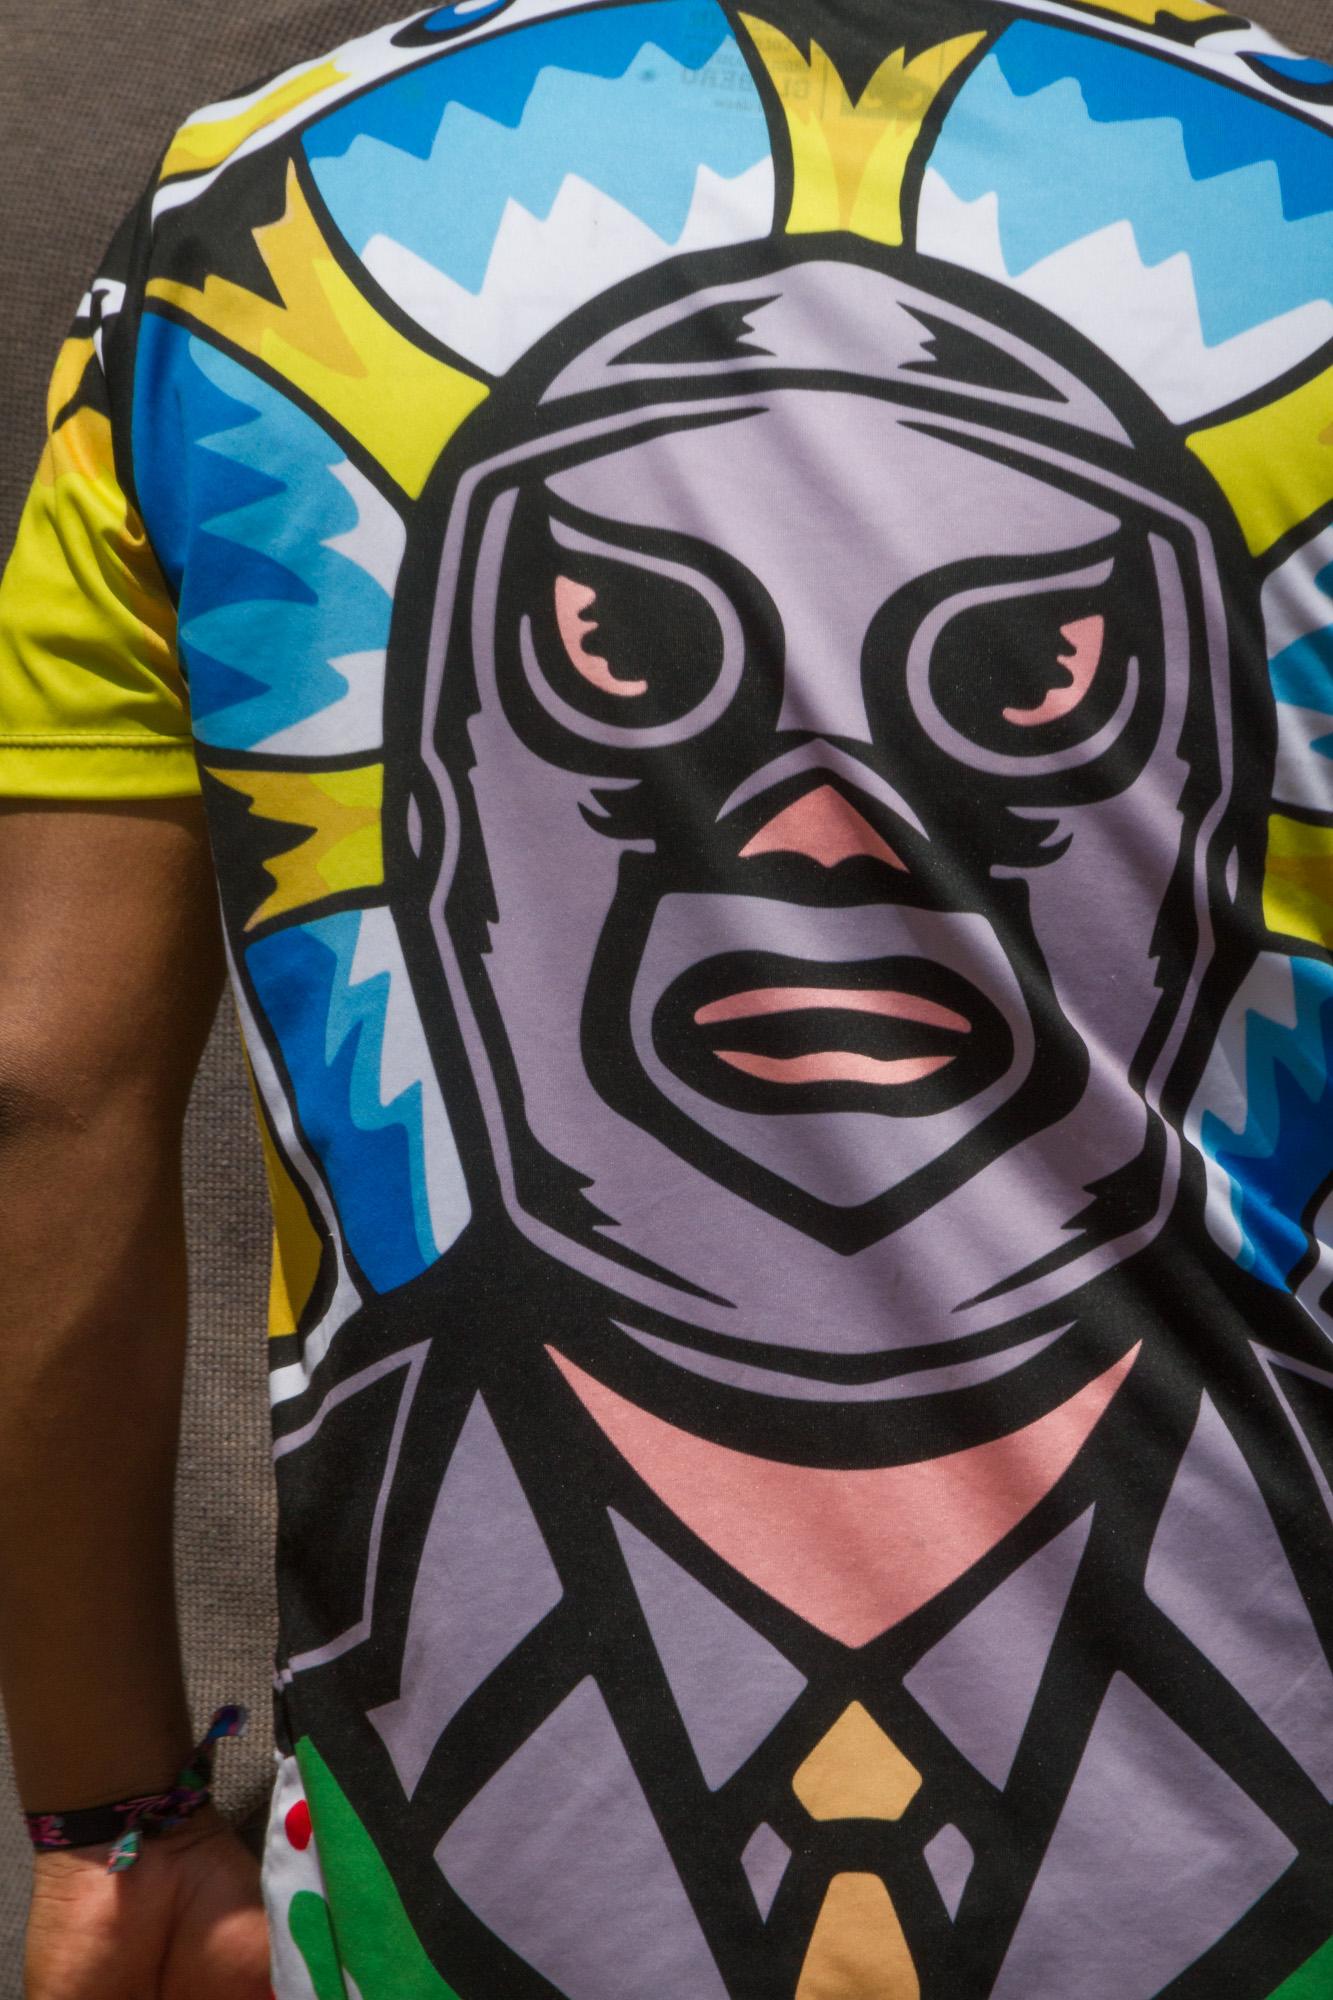 Lucha Libre   CantoyaFest: Pátzcuaro, Michoacán, Mexico — Saturday, July 22, 2017